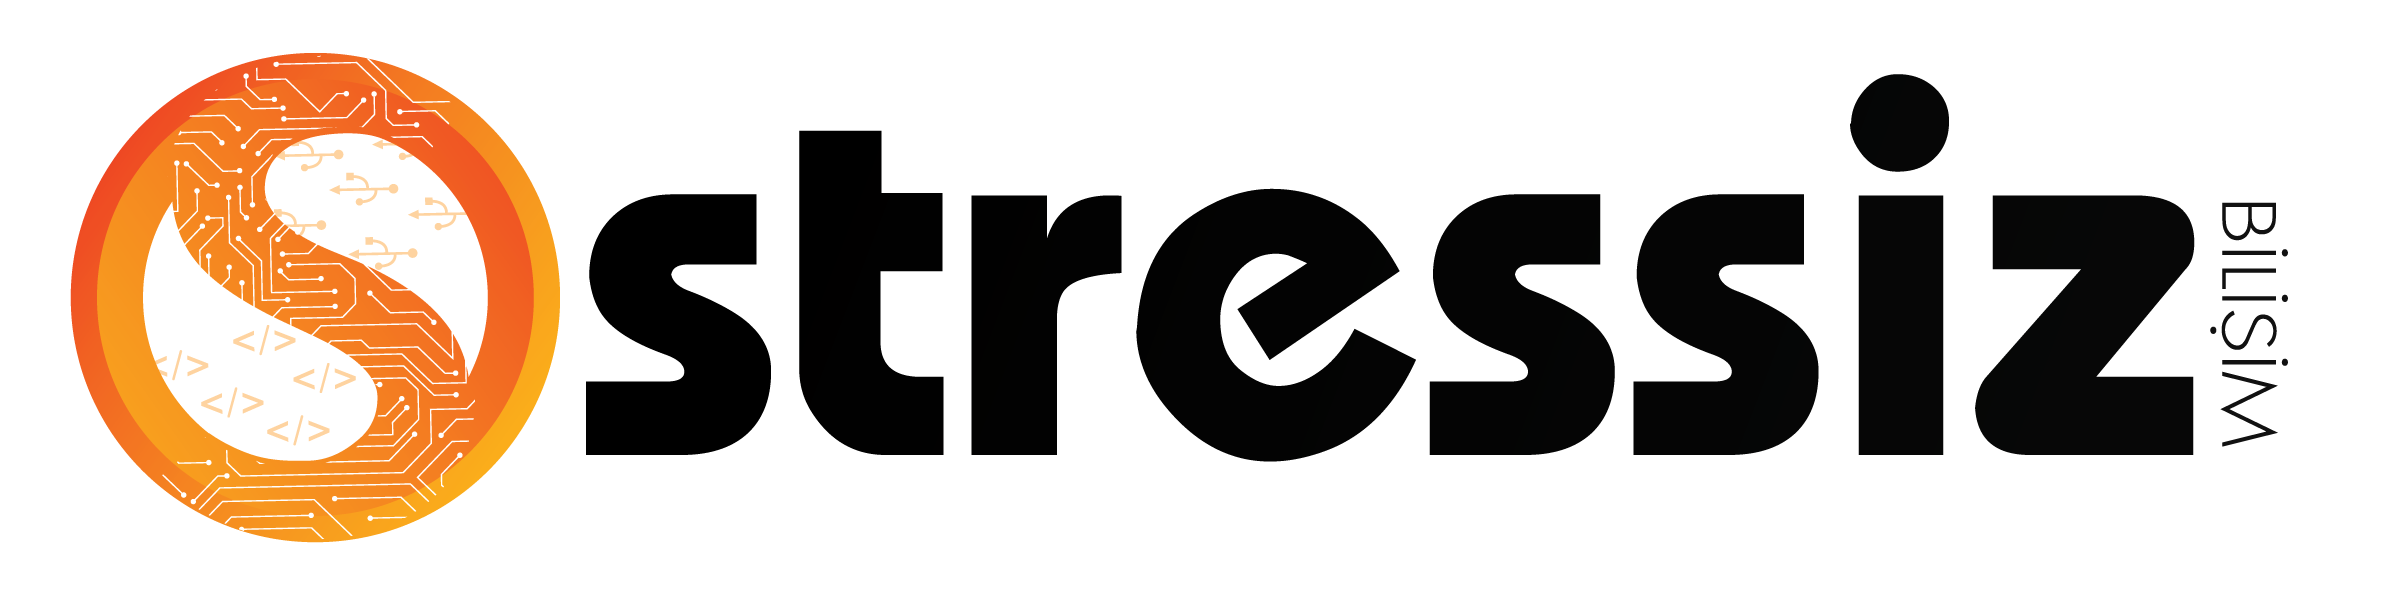 Stressiz Bilişim %100 Mobil Uyumlu Web Sayfası Tasarımı